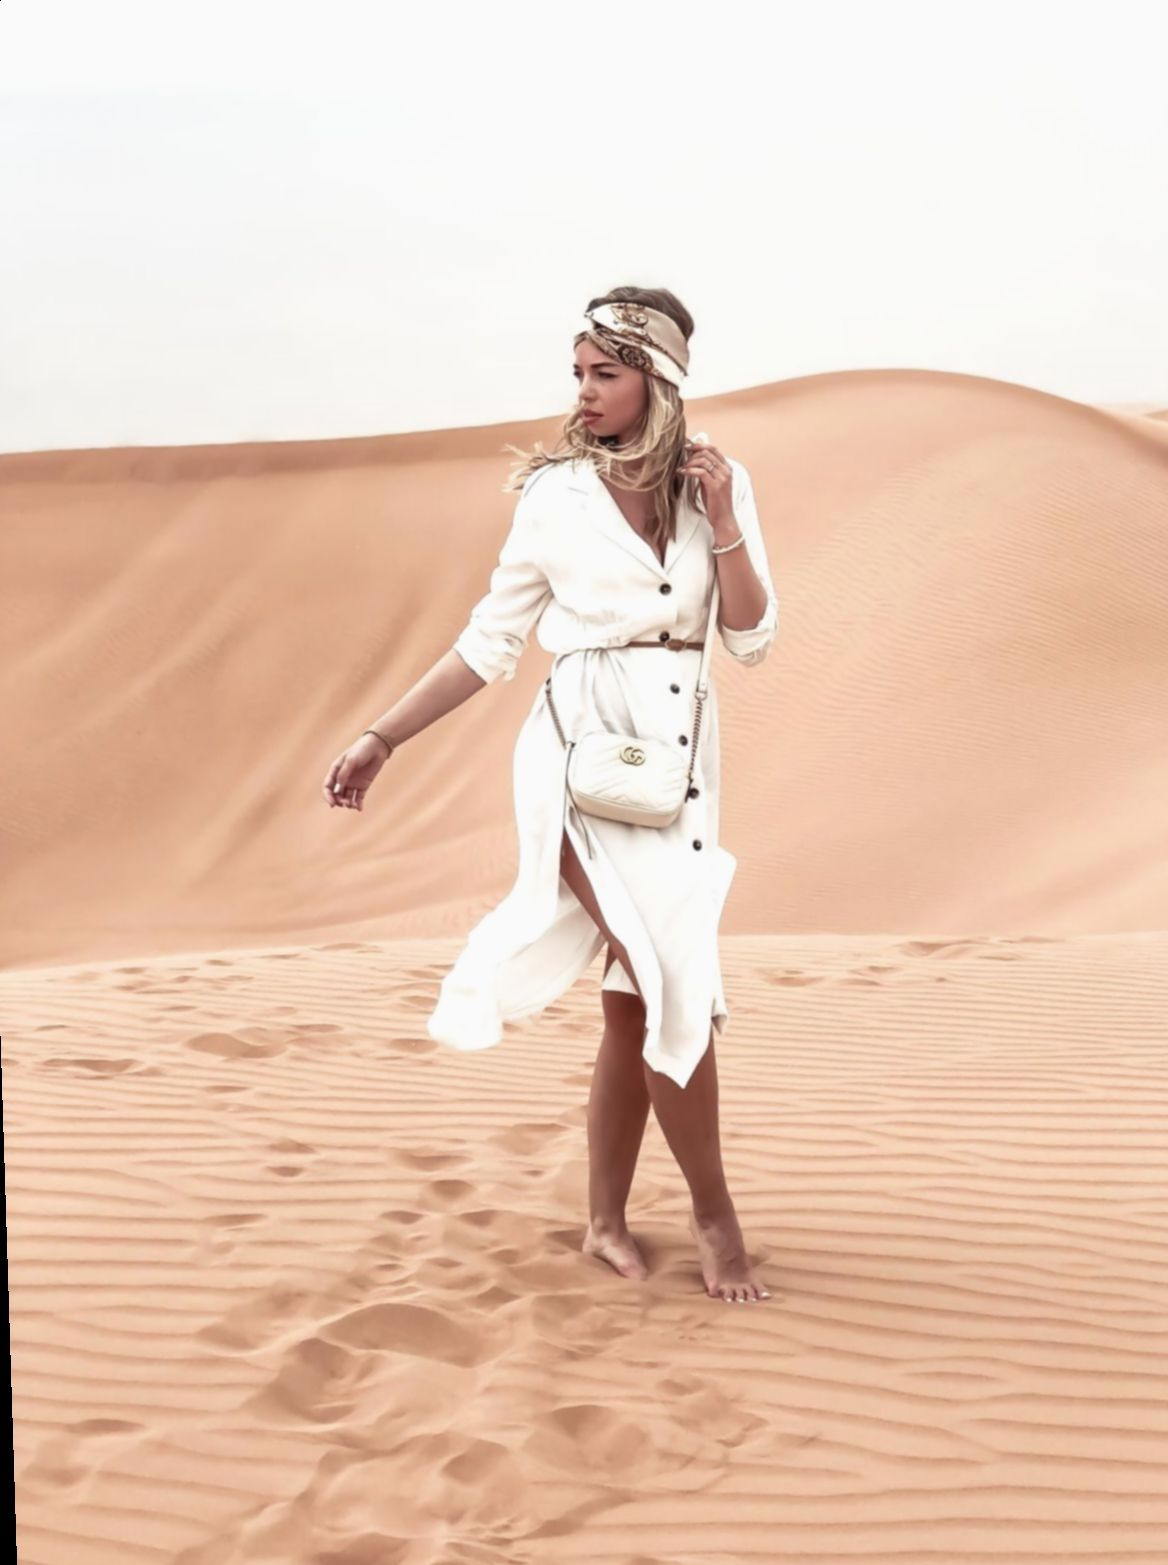 44++ Dubai desert safari outfit ideas ideas